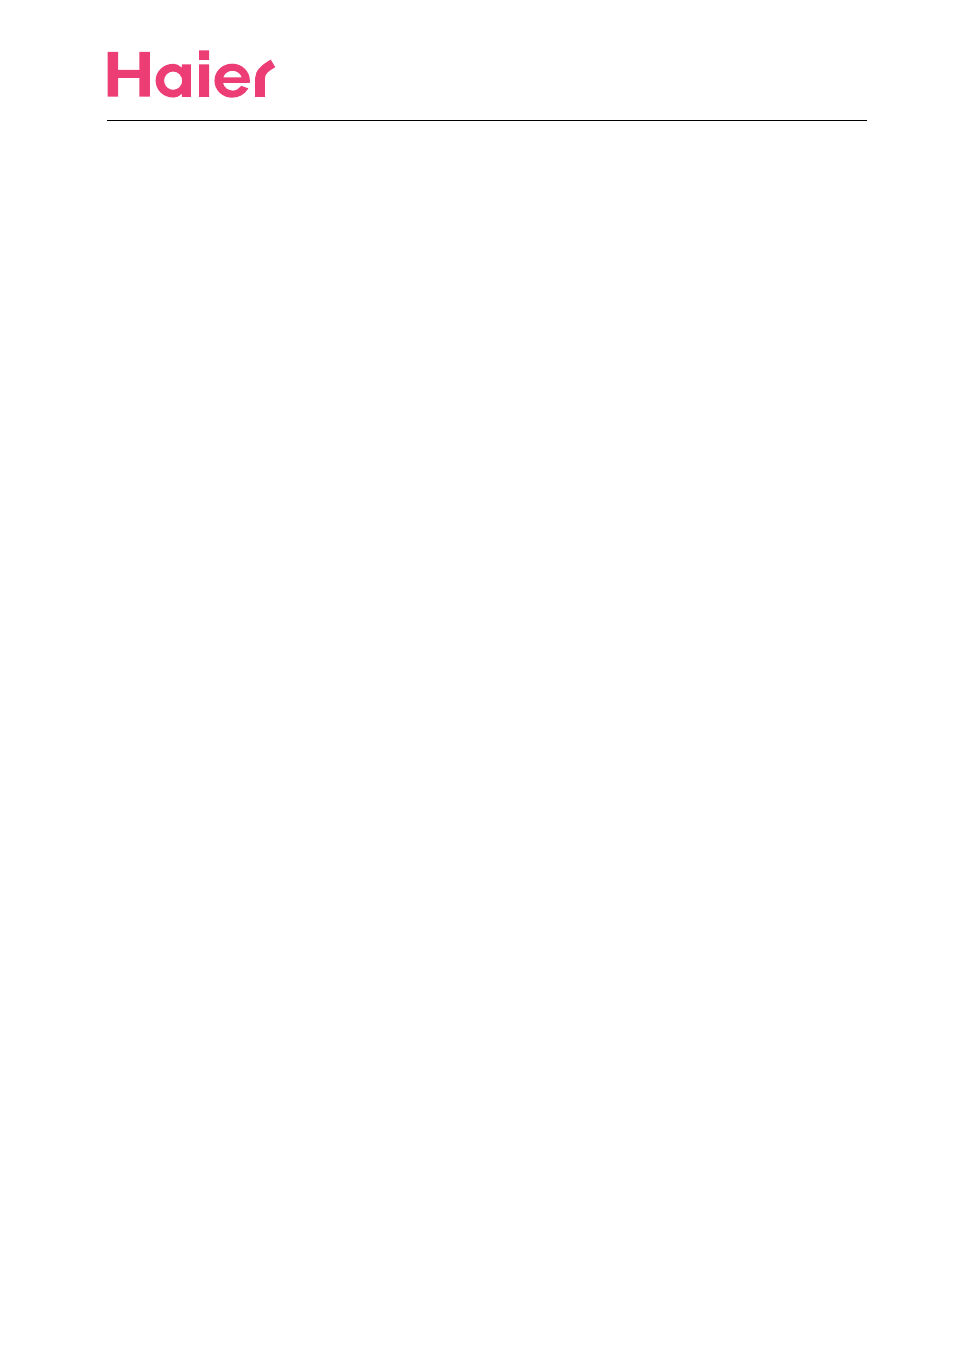 Haier Wiring Diagram | Wiring Diagram on